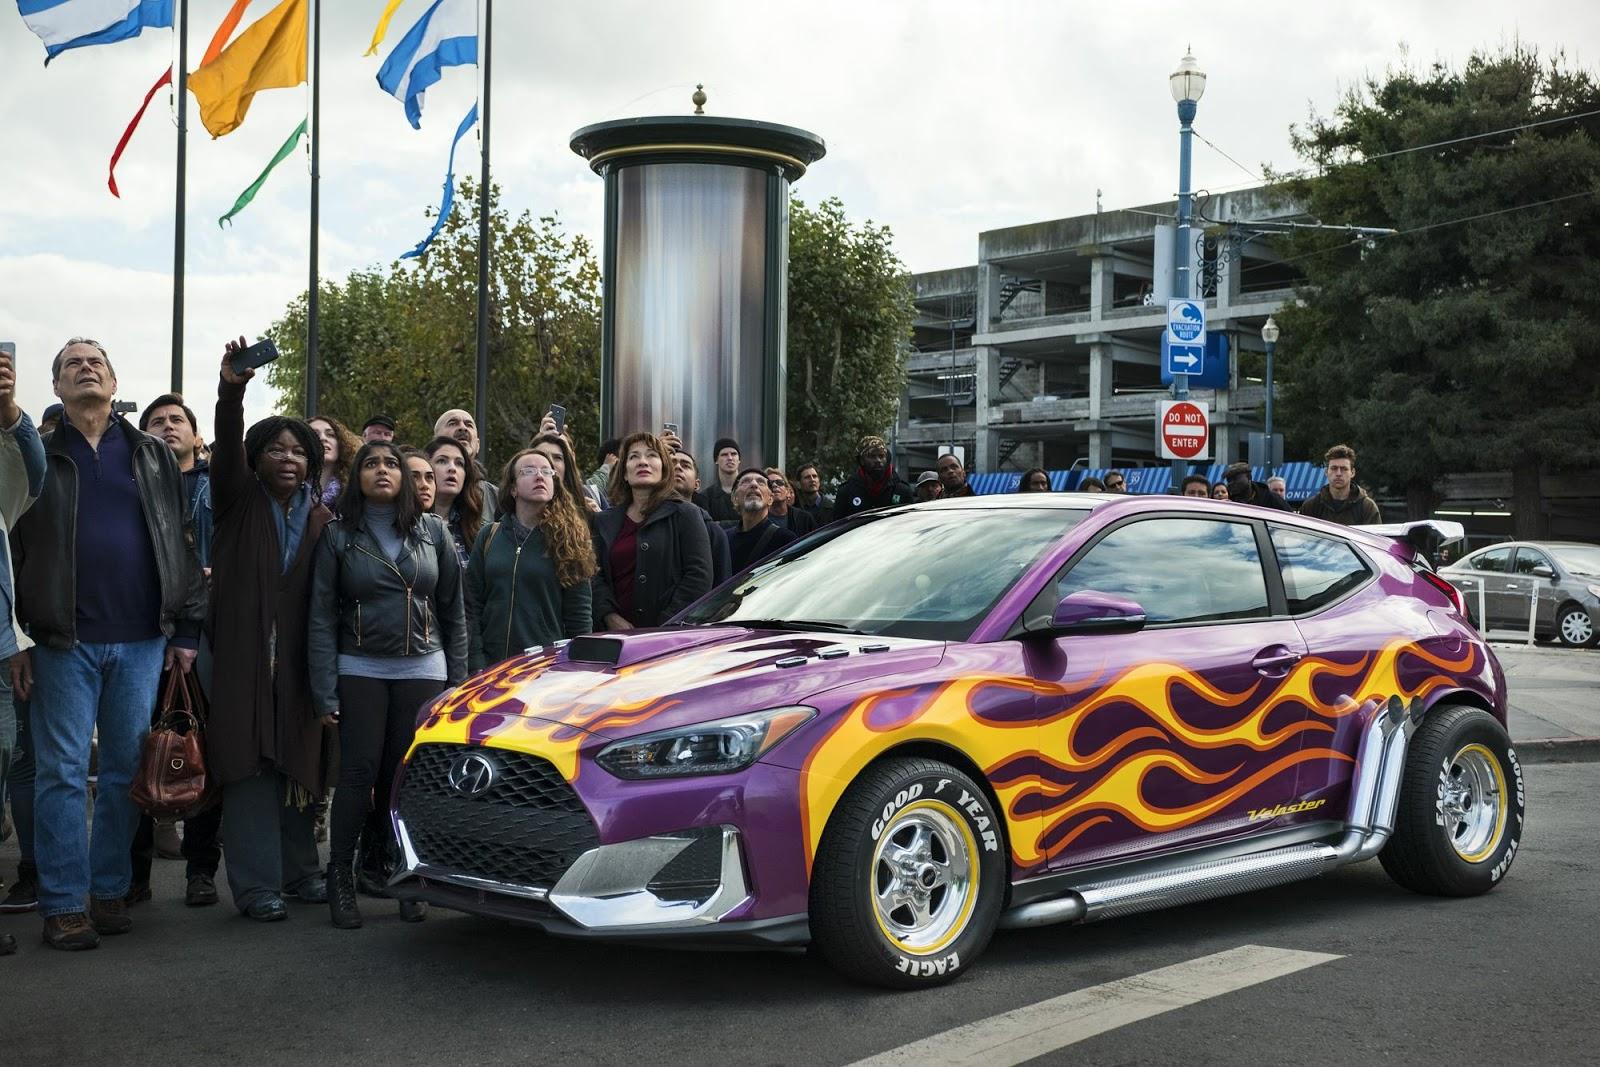 20192BHyundaiVelosterMarvelStudiosAnt ManandtheWasp Η Hyundai ξεκίνησε την καριέρα της στο Hollywood! Hyundai